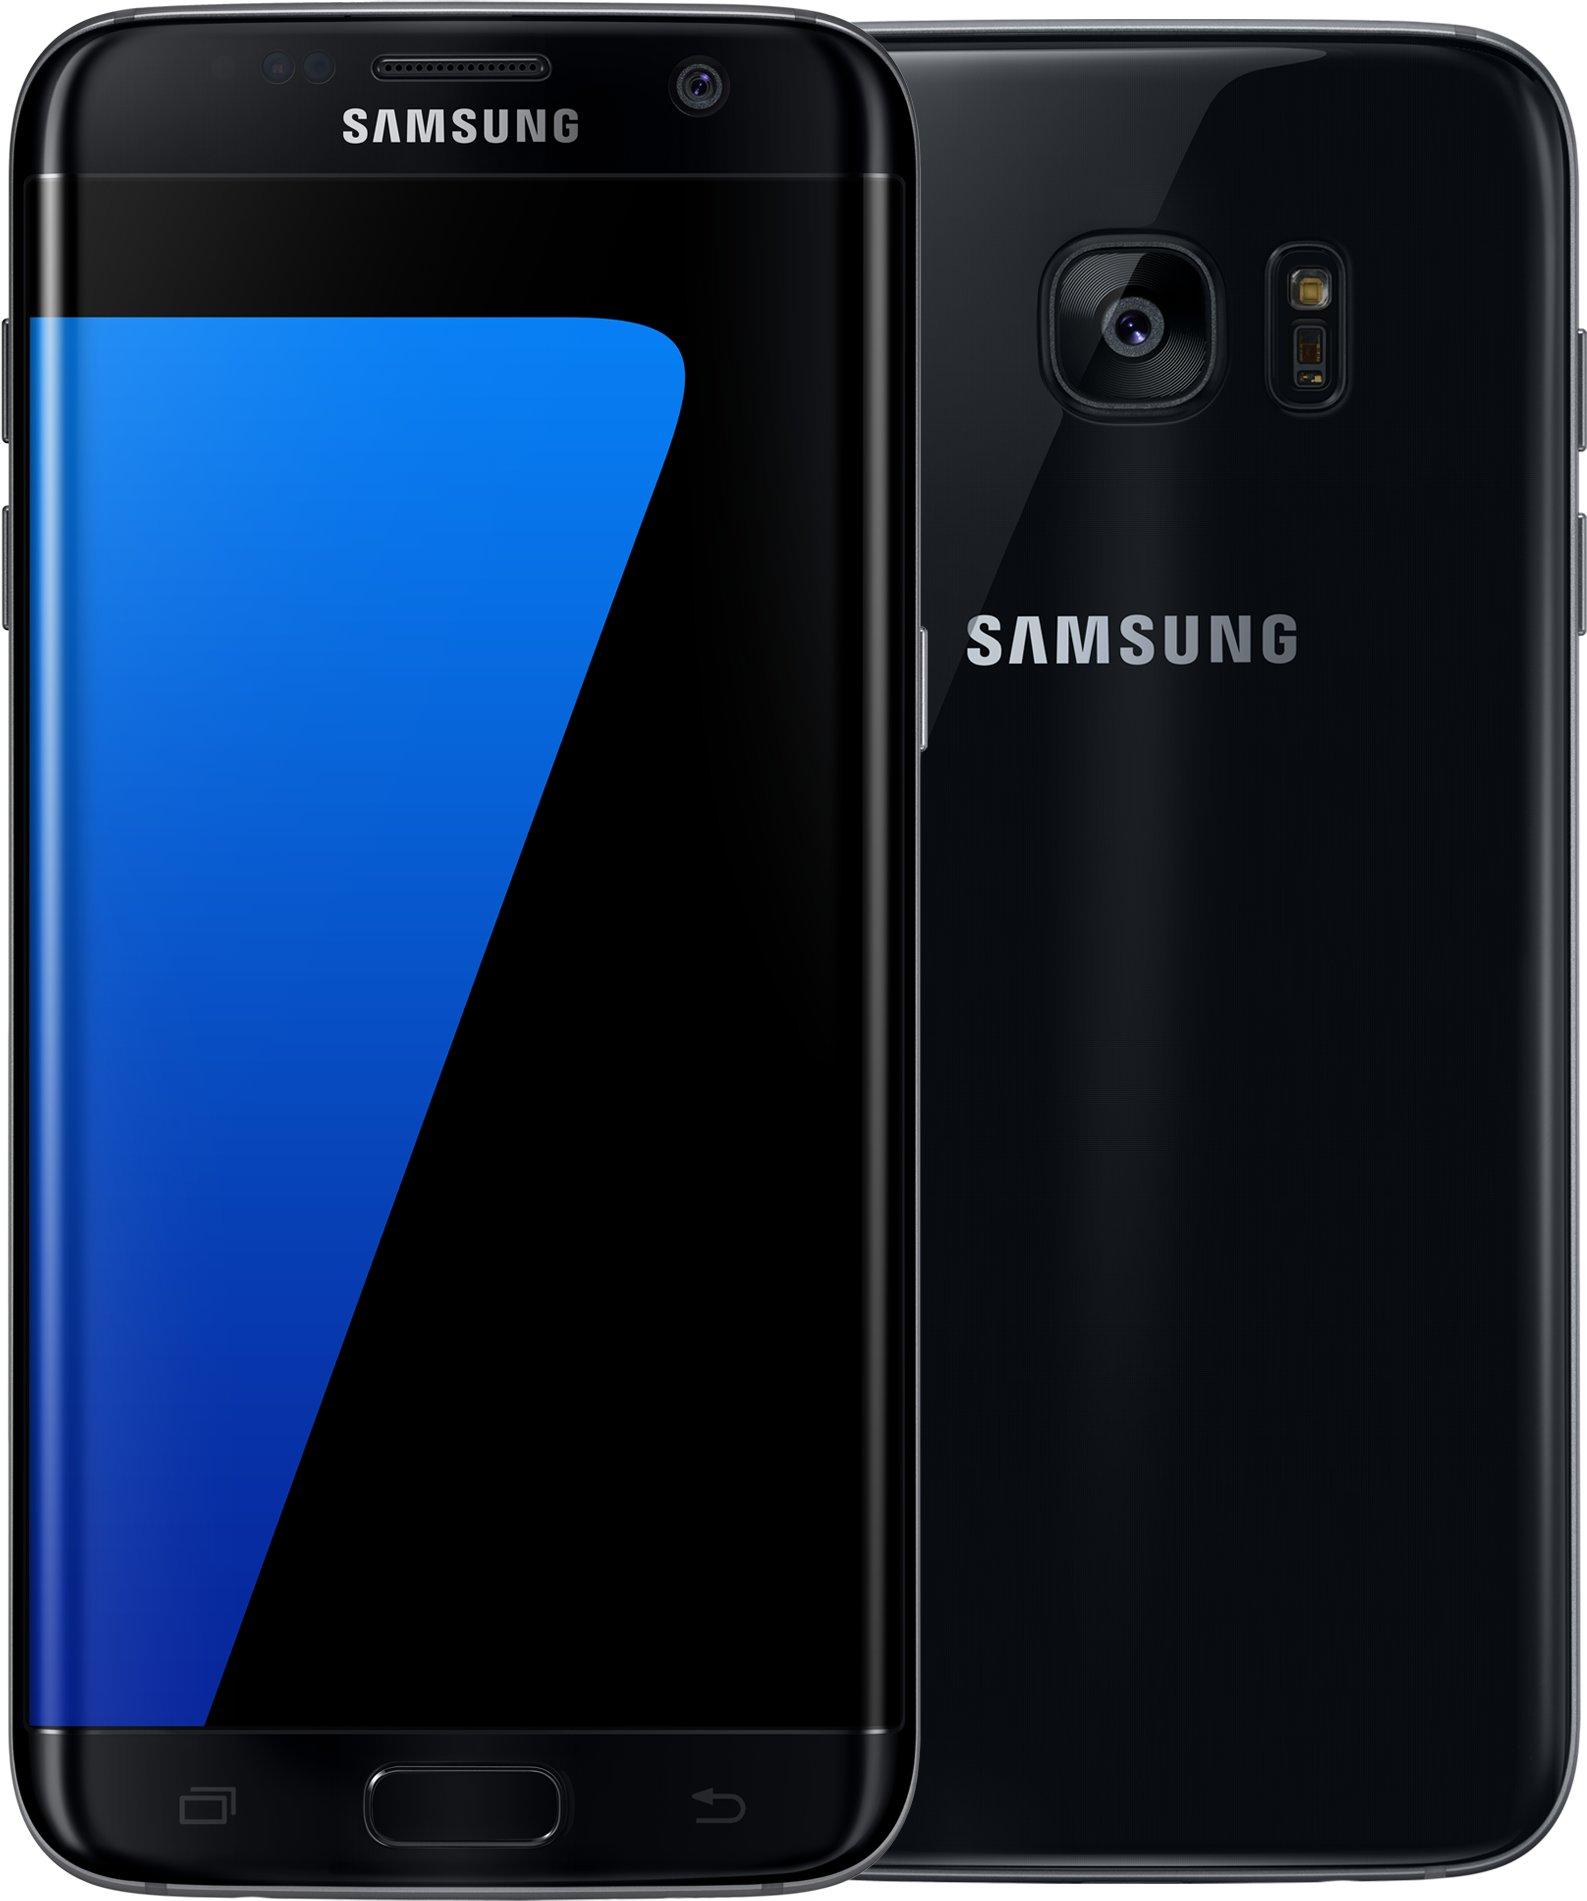 Samsung Galaxy S7 Edge Black Pearl - 32GB